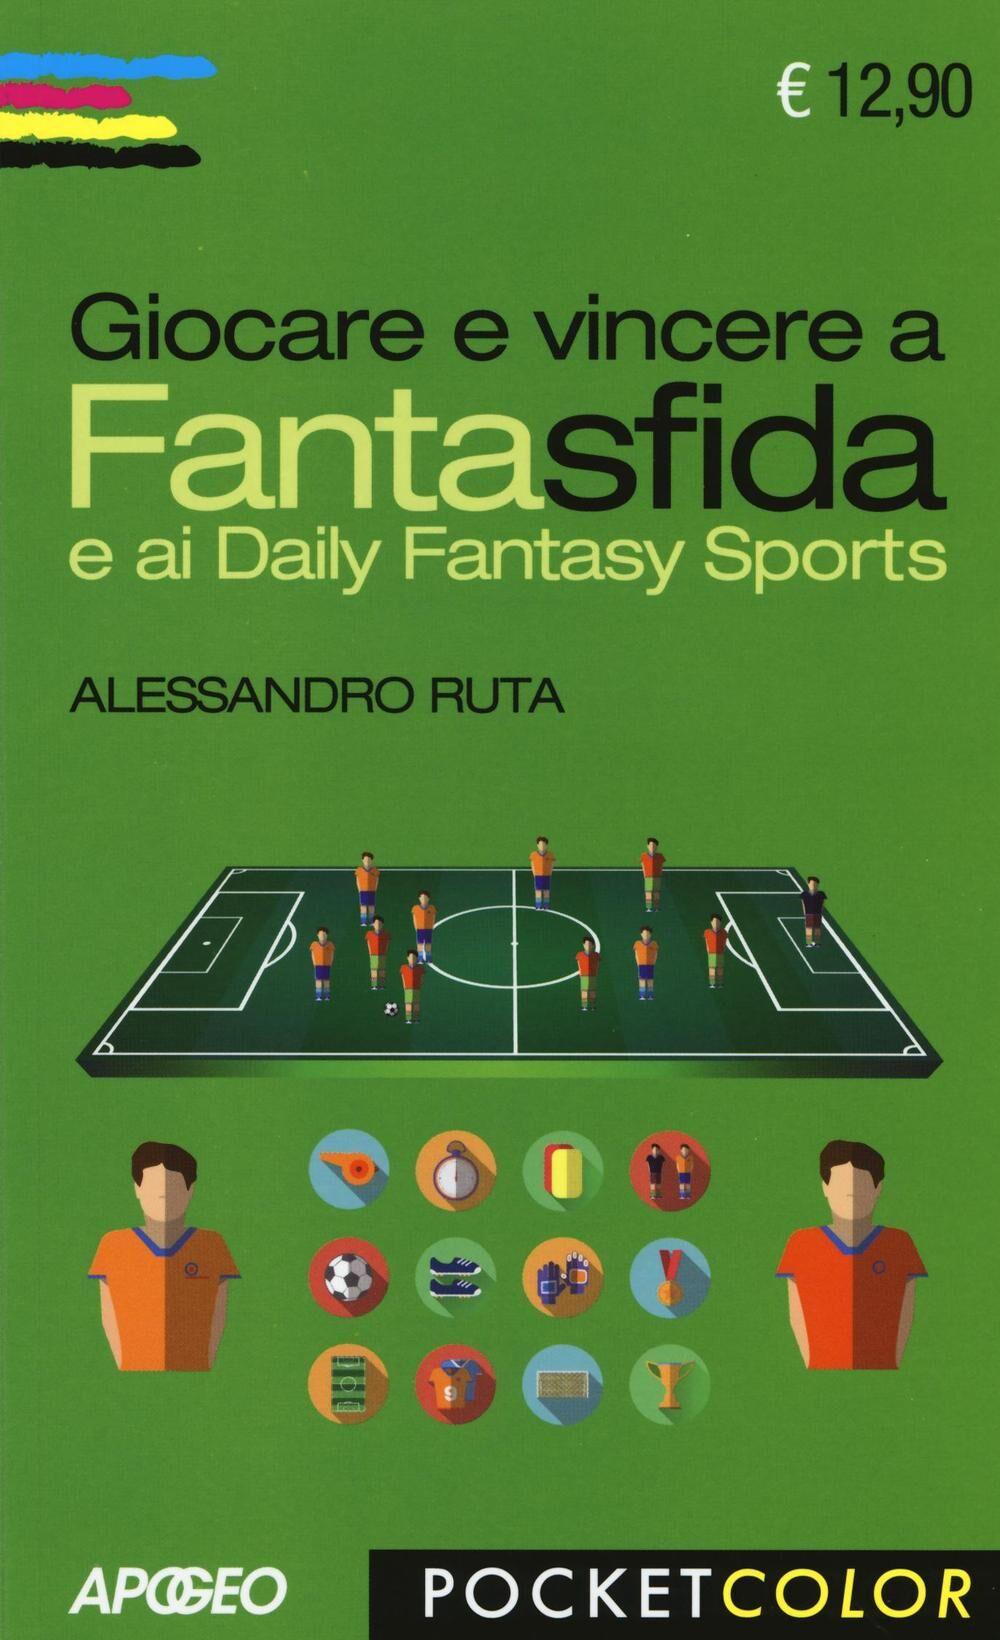 Giocare e vincere a Fantasfida e ai Daily Fantasy Sports